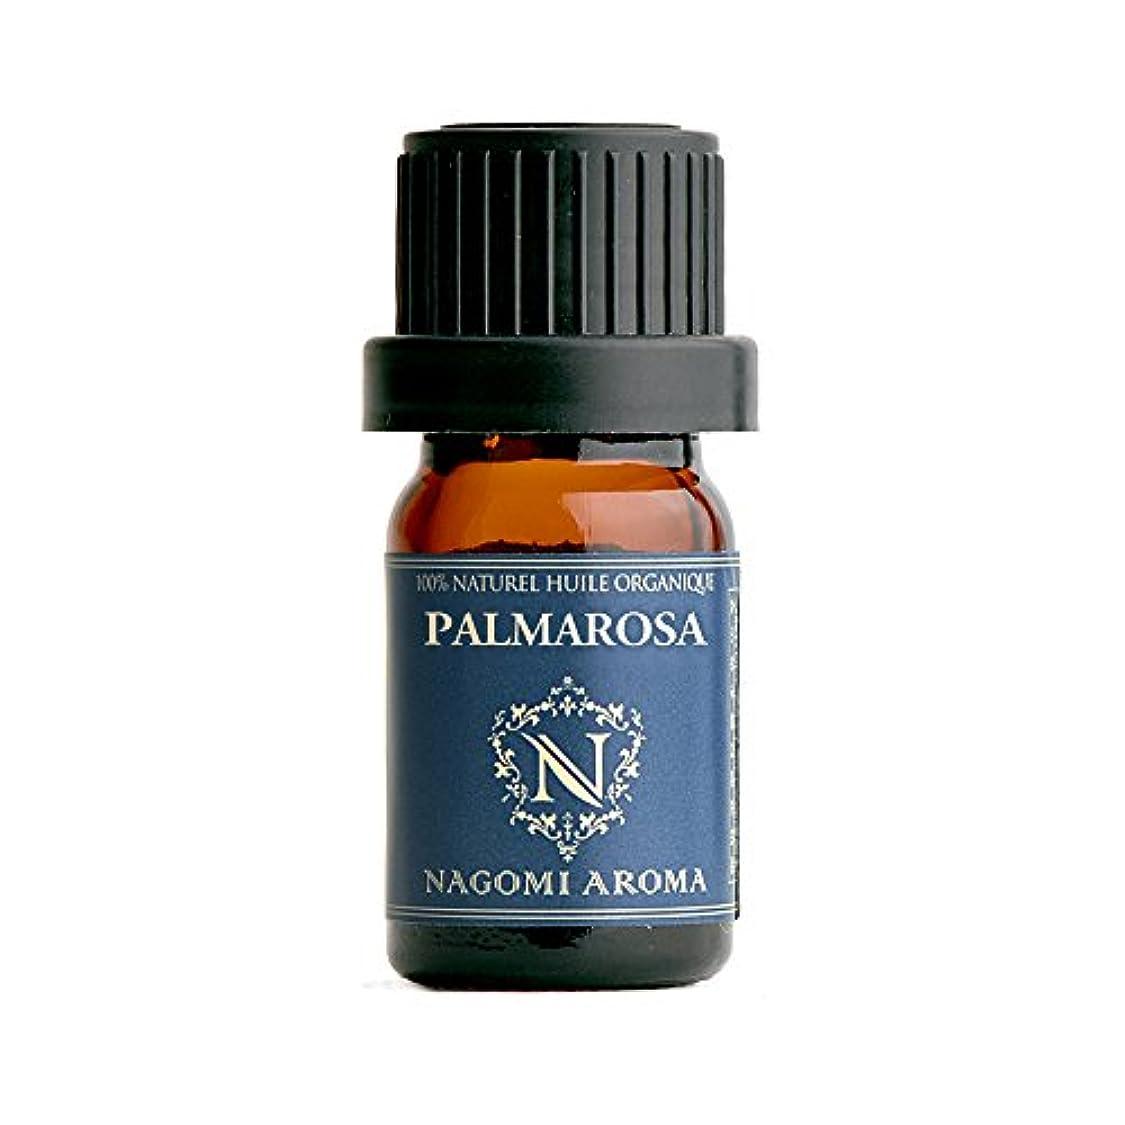 NAGOMI AROMA オーガニック パルマローザ5ml 【AEAJ認定精油】【アロマオイル】